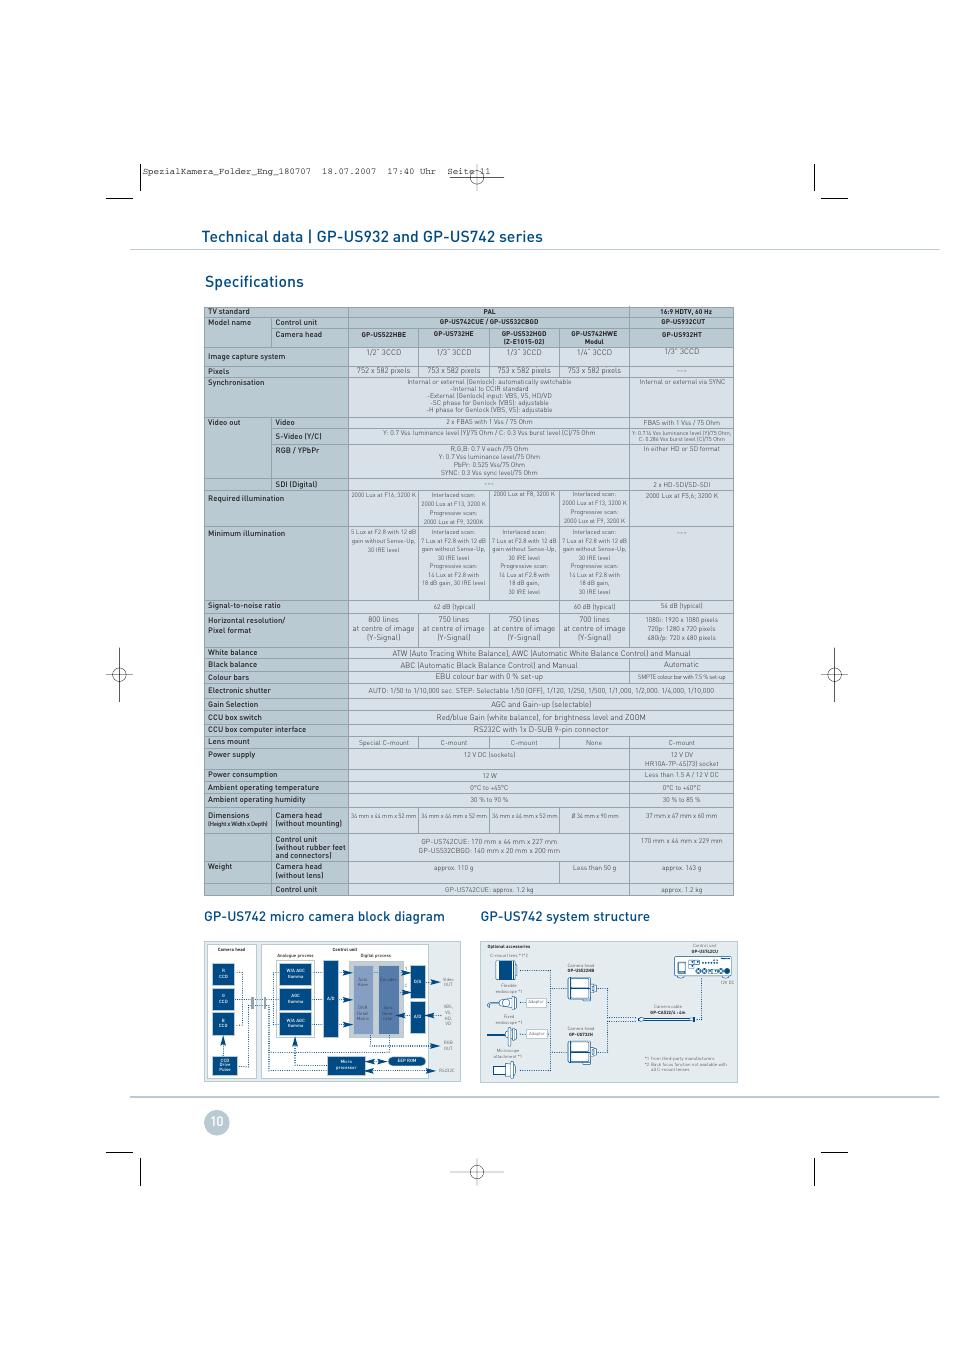 Gp-us742 system structure, Gp-us742 micro camera block diagram | Panasonic  GP